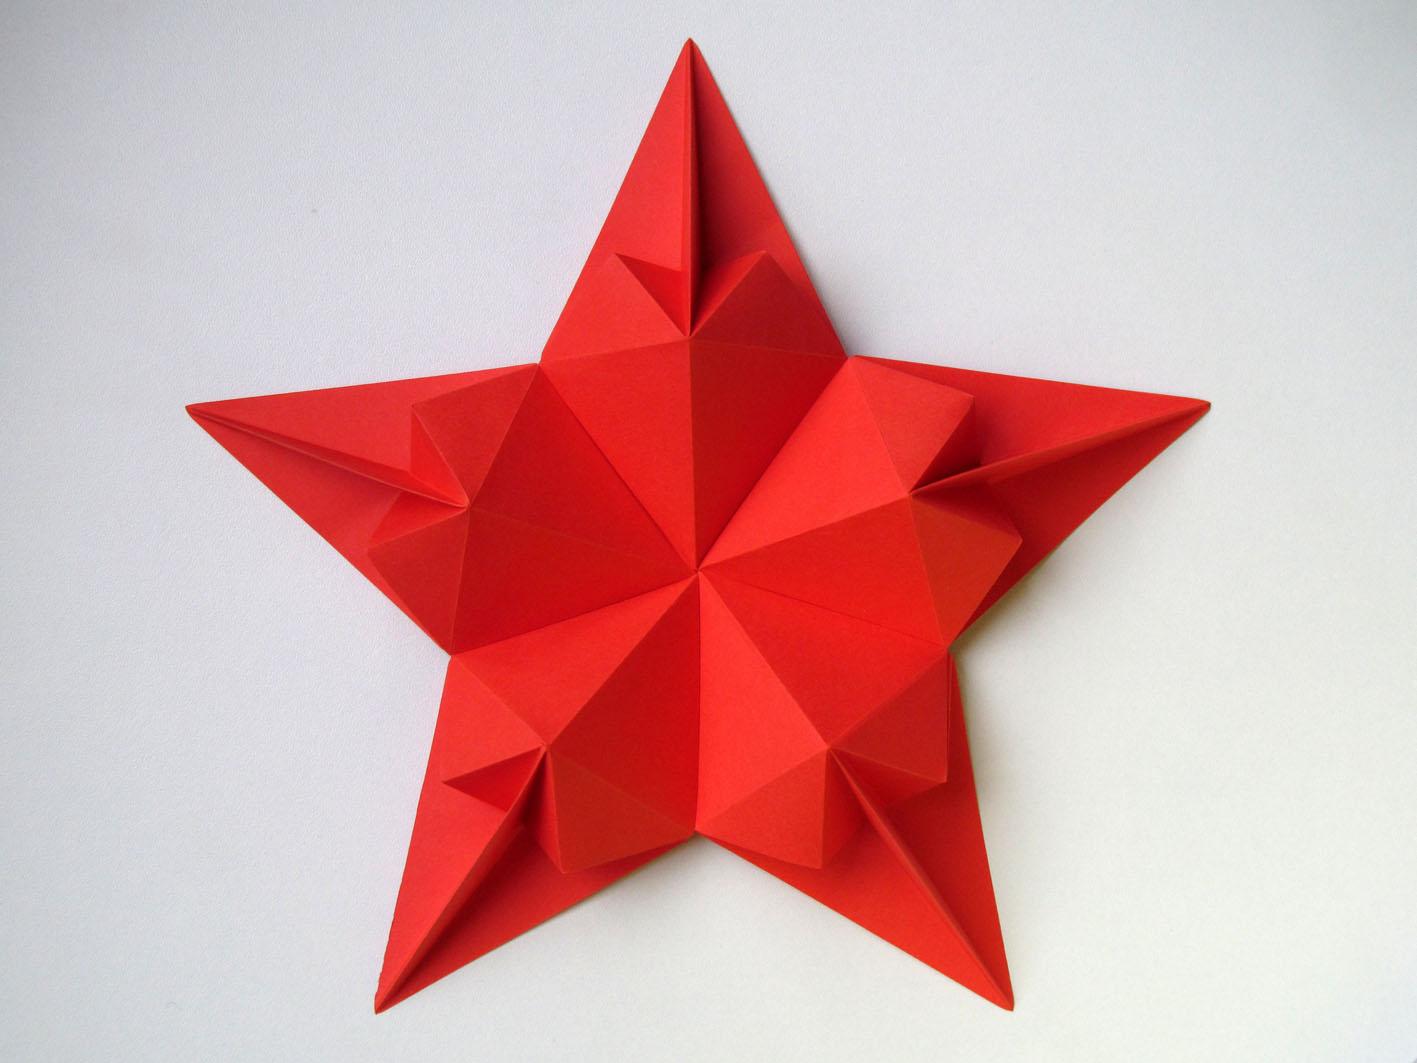 La Stella Di Natale Poesia.Origami Poesie Di Carta Stella Di Cuori